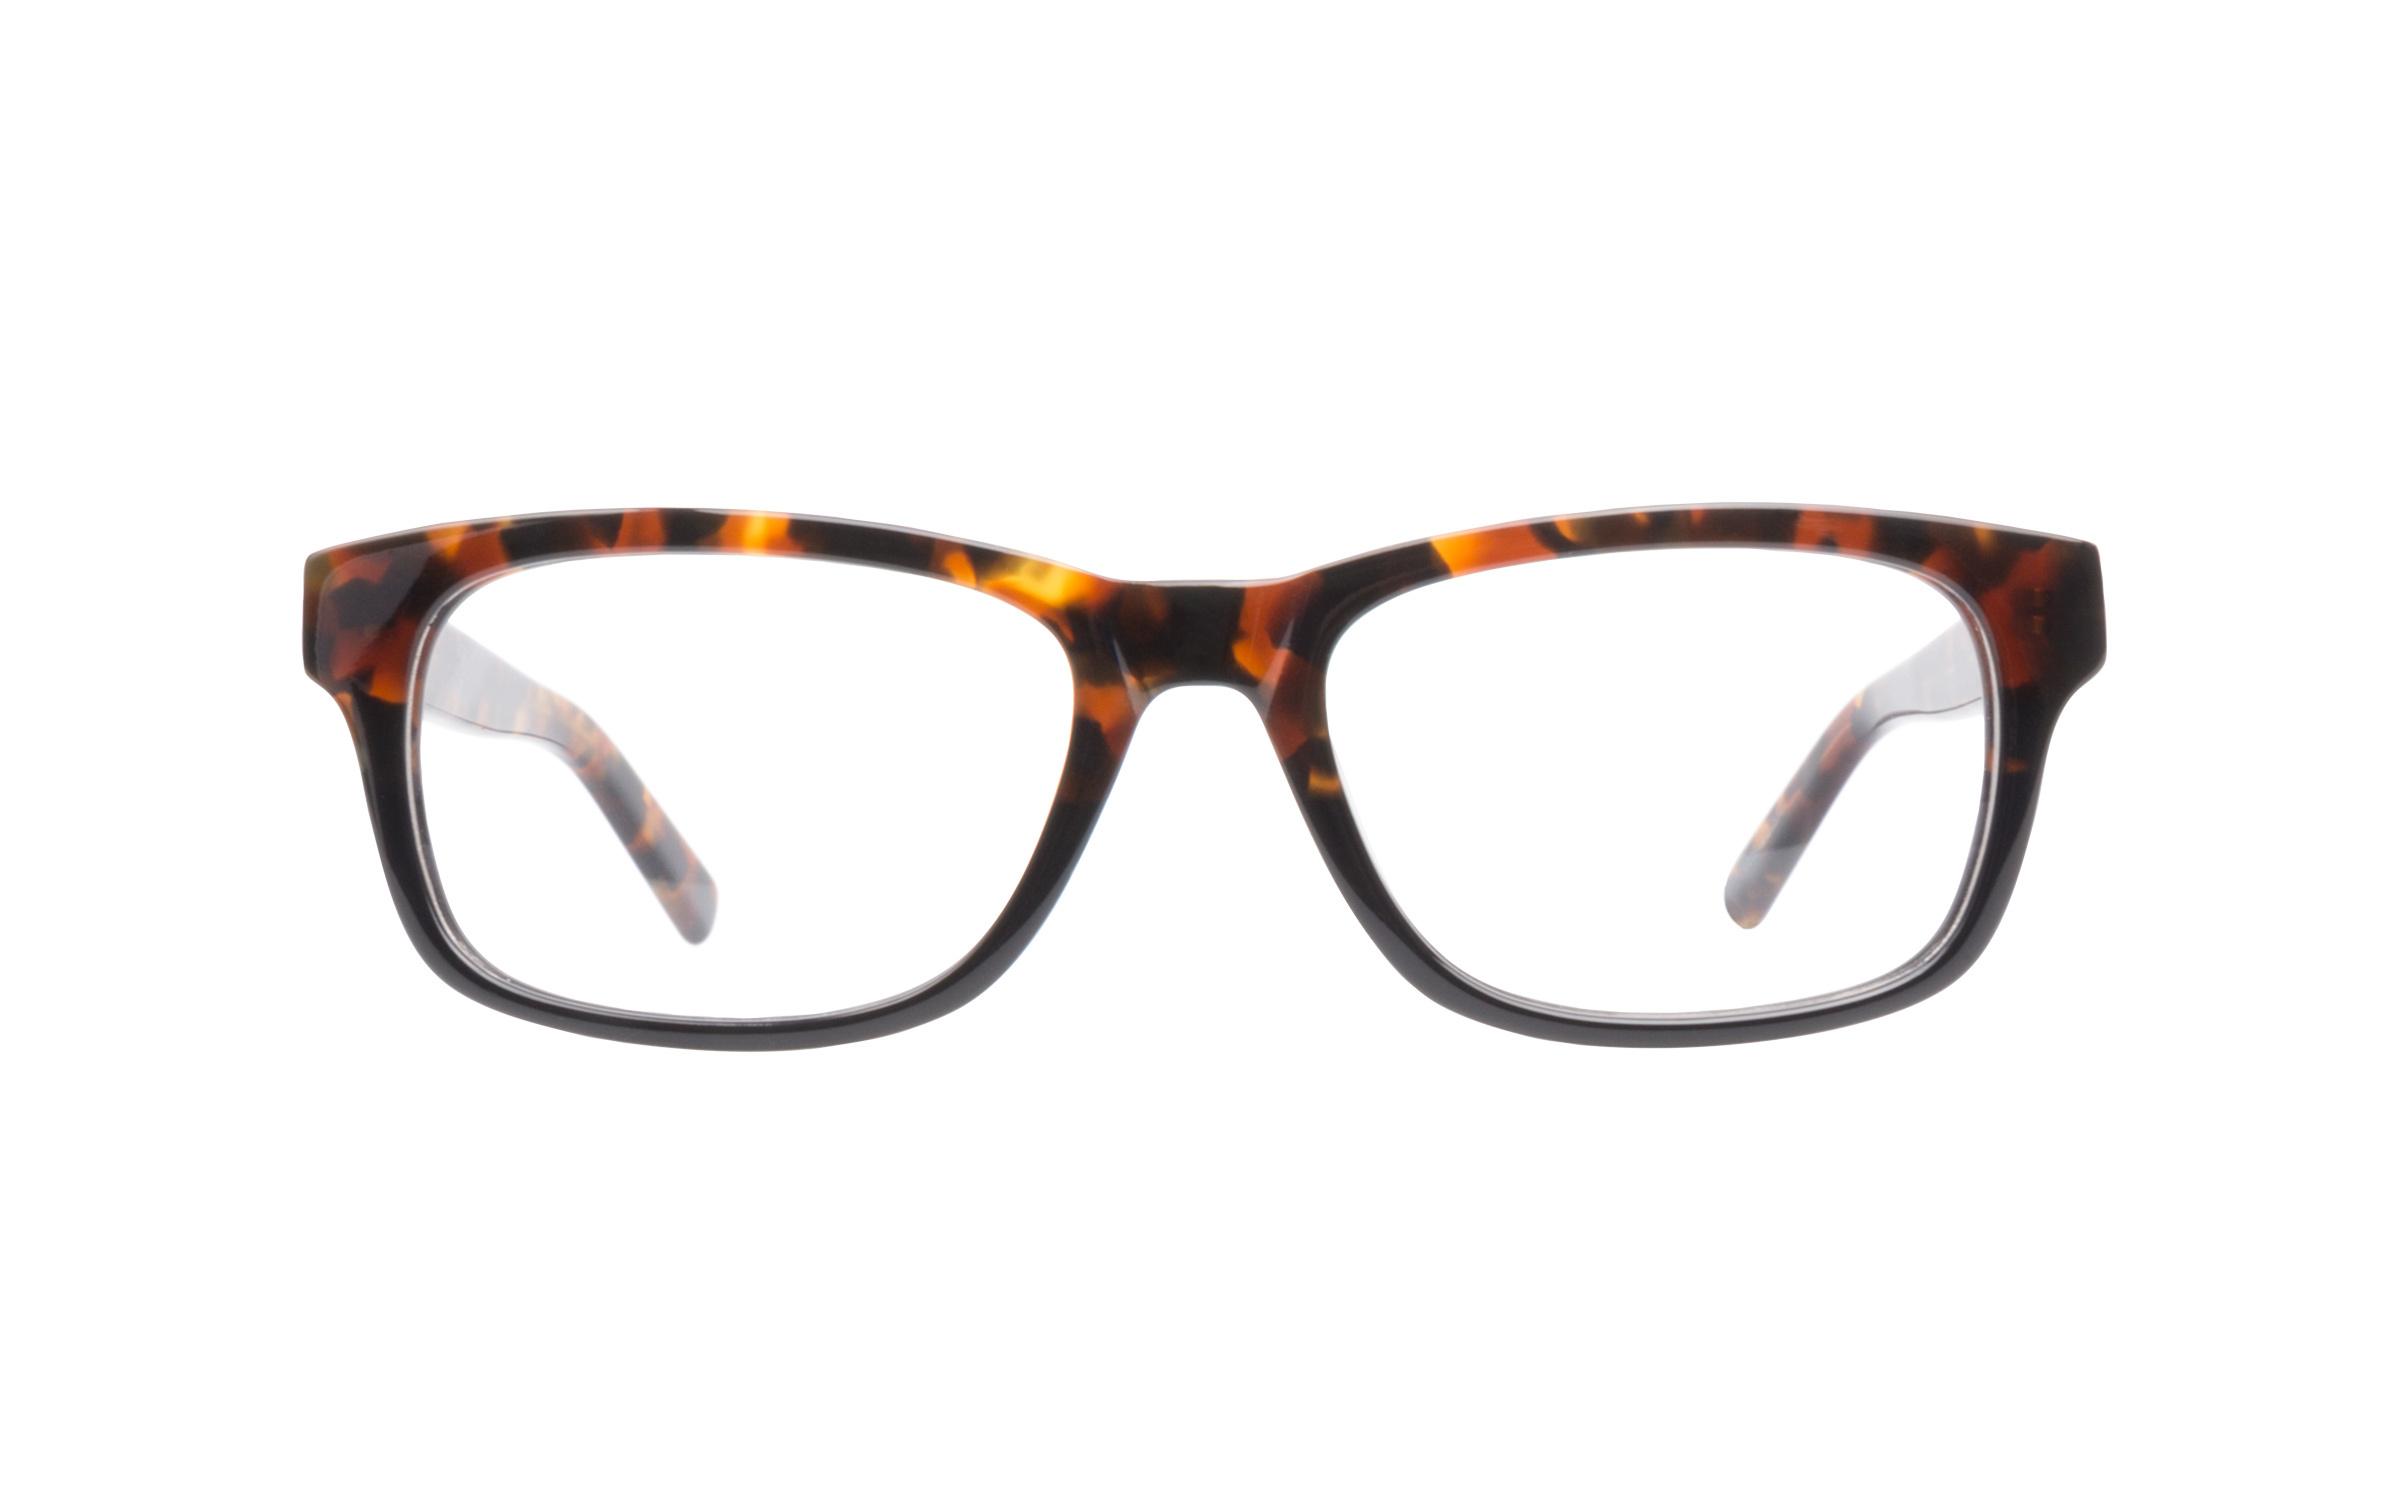 Glasses_TortoiseBrown_7_for_All_Mankind_Online_Coastal